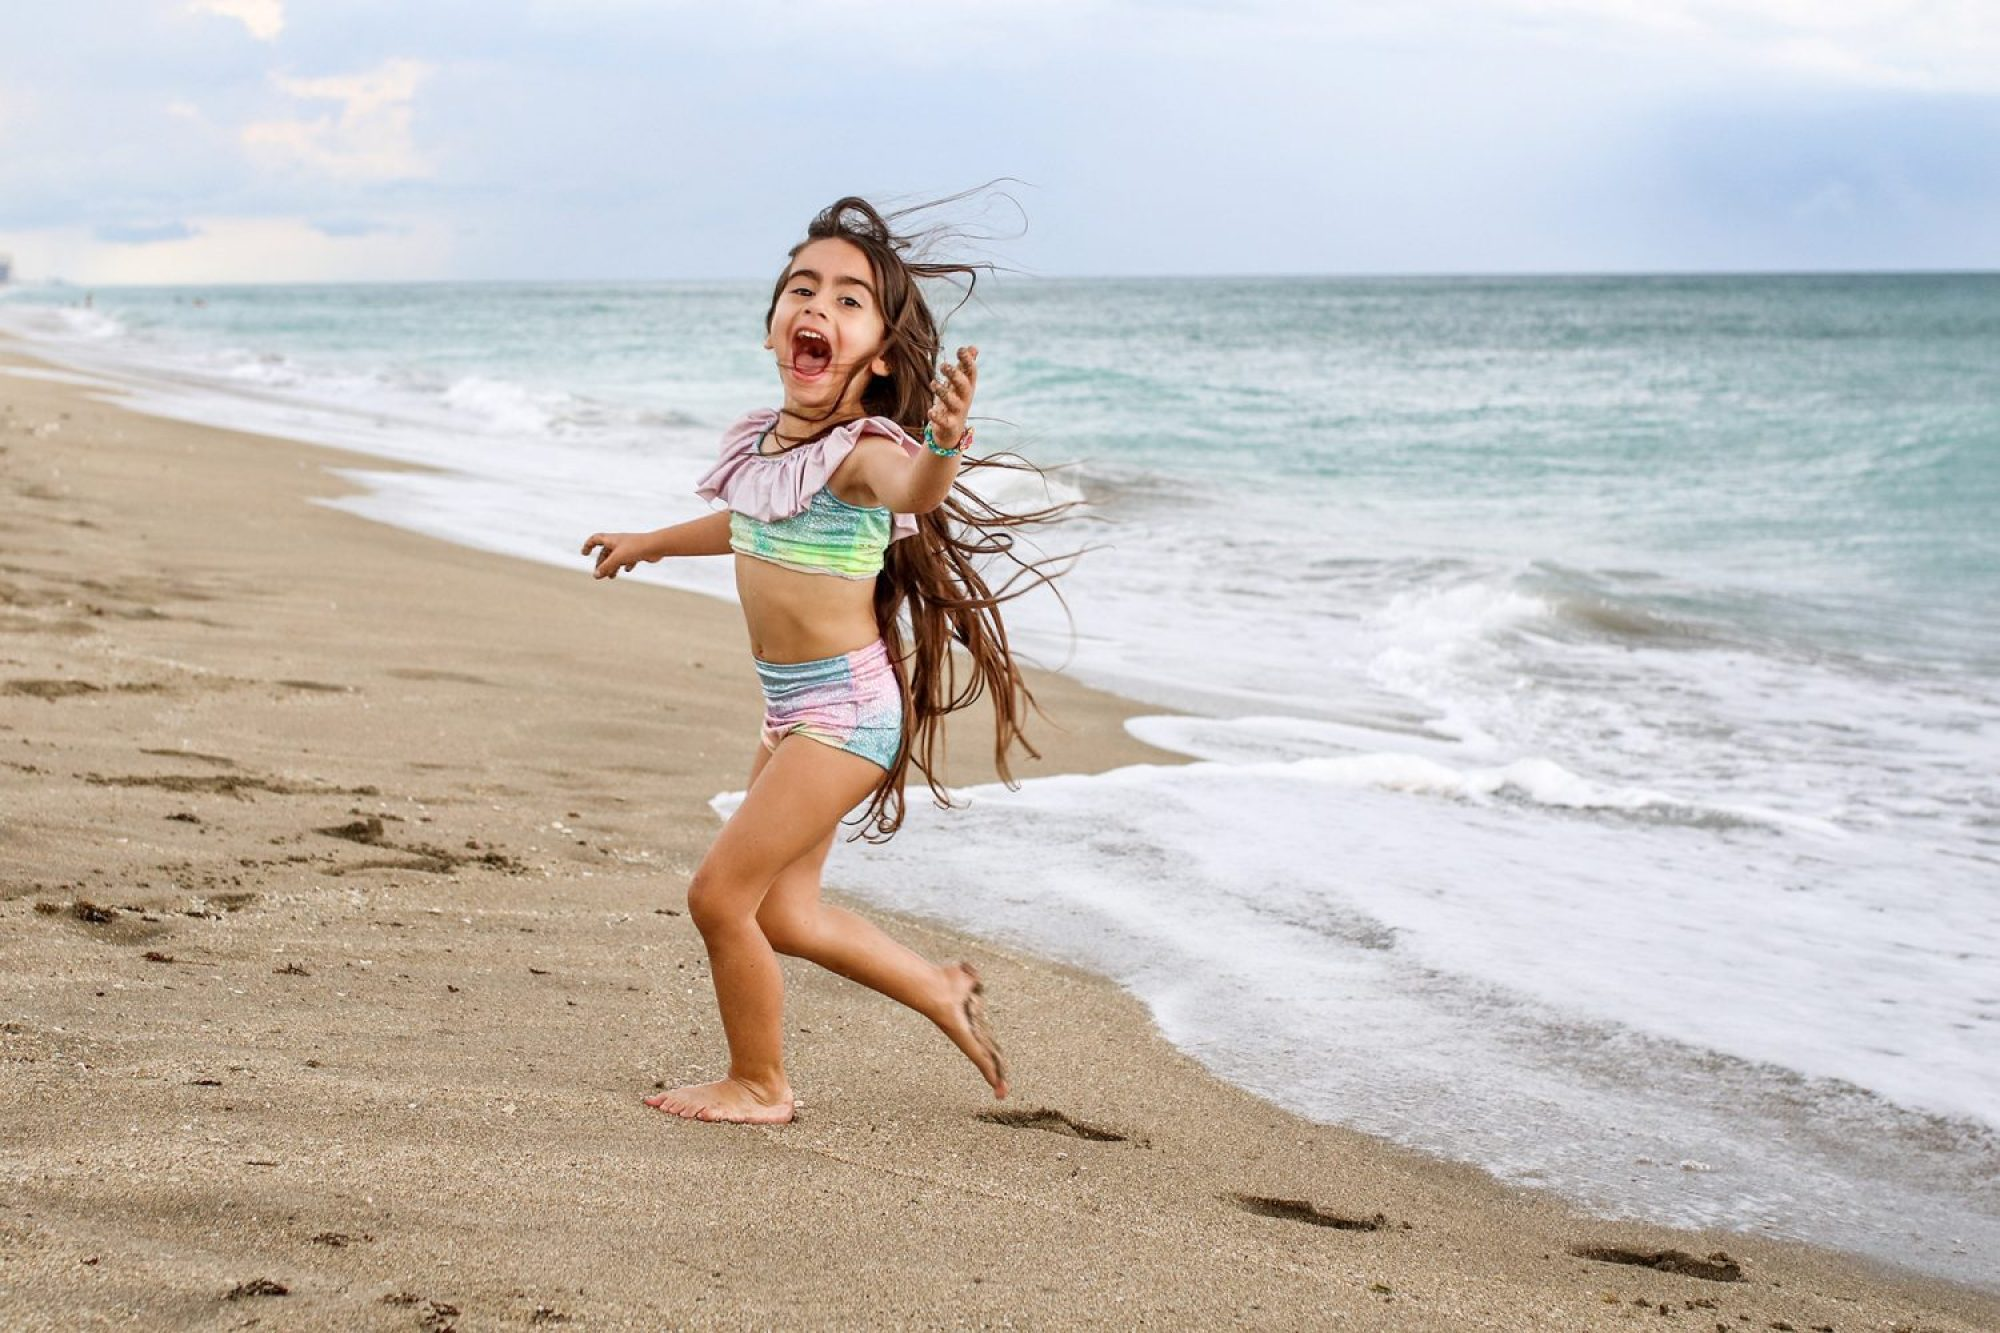 hutchinson shores resort, family friendly hotel, jensen beach, hutchinson island, florida, florida hotels, beach, florida beach, road trip, family road trip, family vacation, travel, trip, mommy blog, mom blogger, family blog, family influencer, instagram, mother, father, tween blog, dad blog, travel family blog, United States, family travel blogs, 2018, mom blog, top, best, mommy blogger, daddy blog, tween blogger, child brand influencer, the super mom life, dad blog, dad blogger